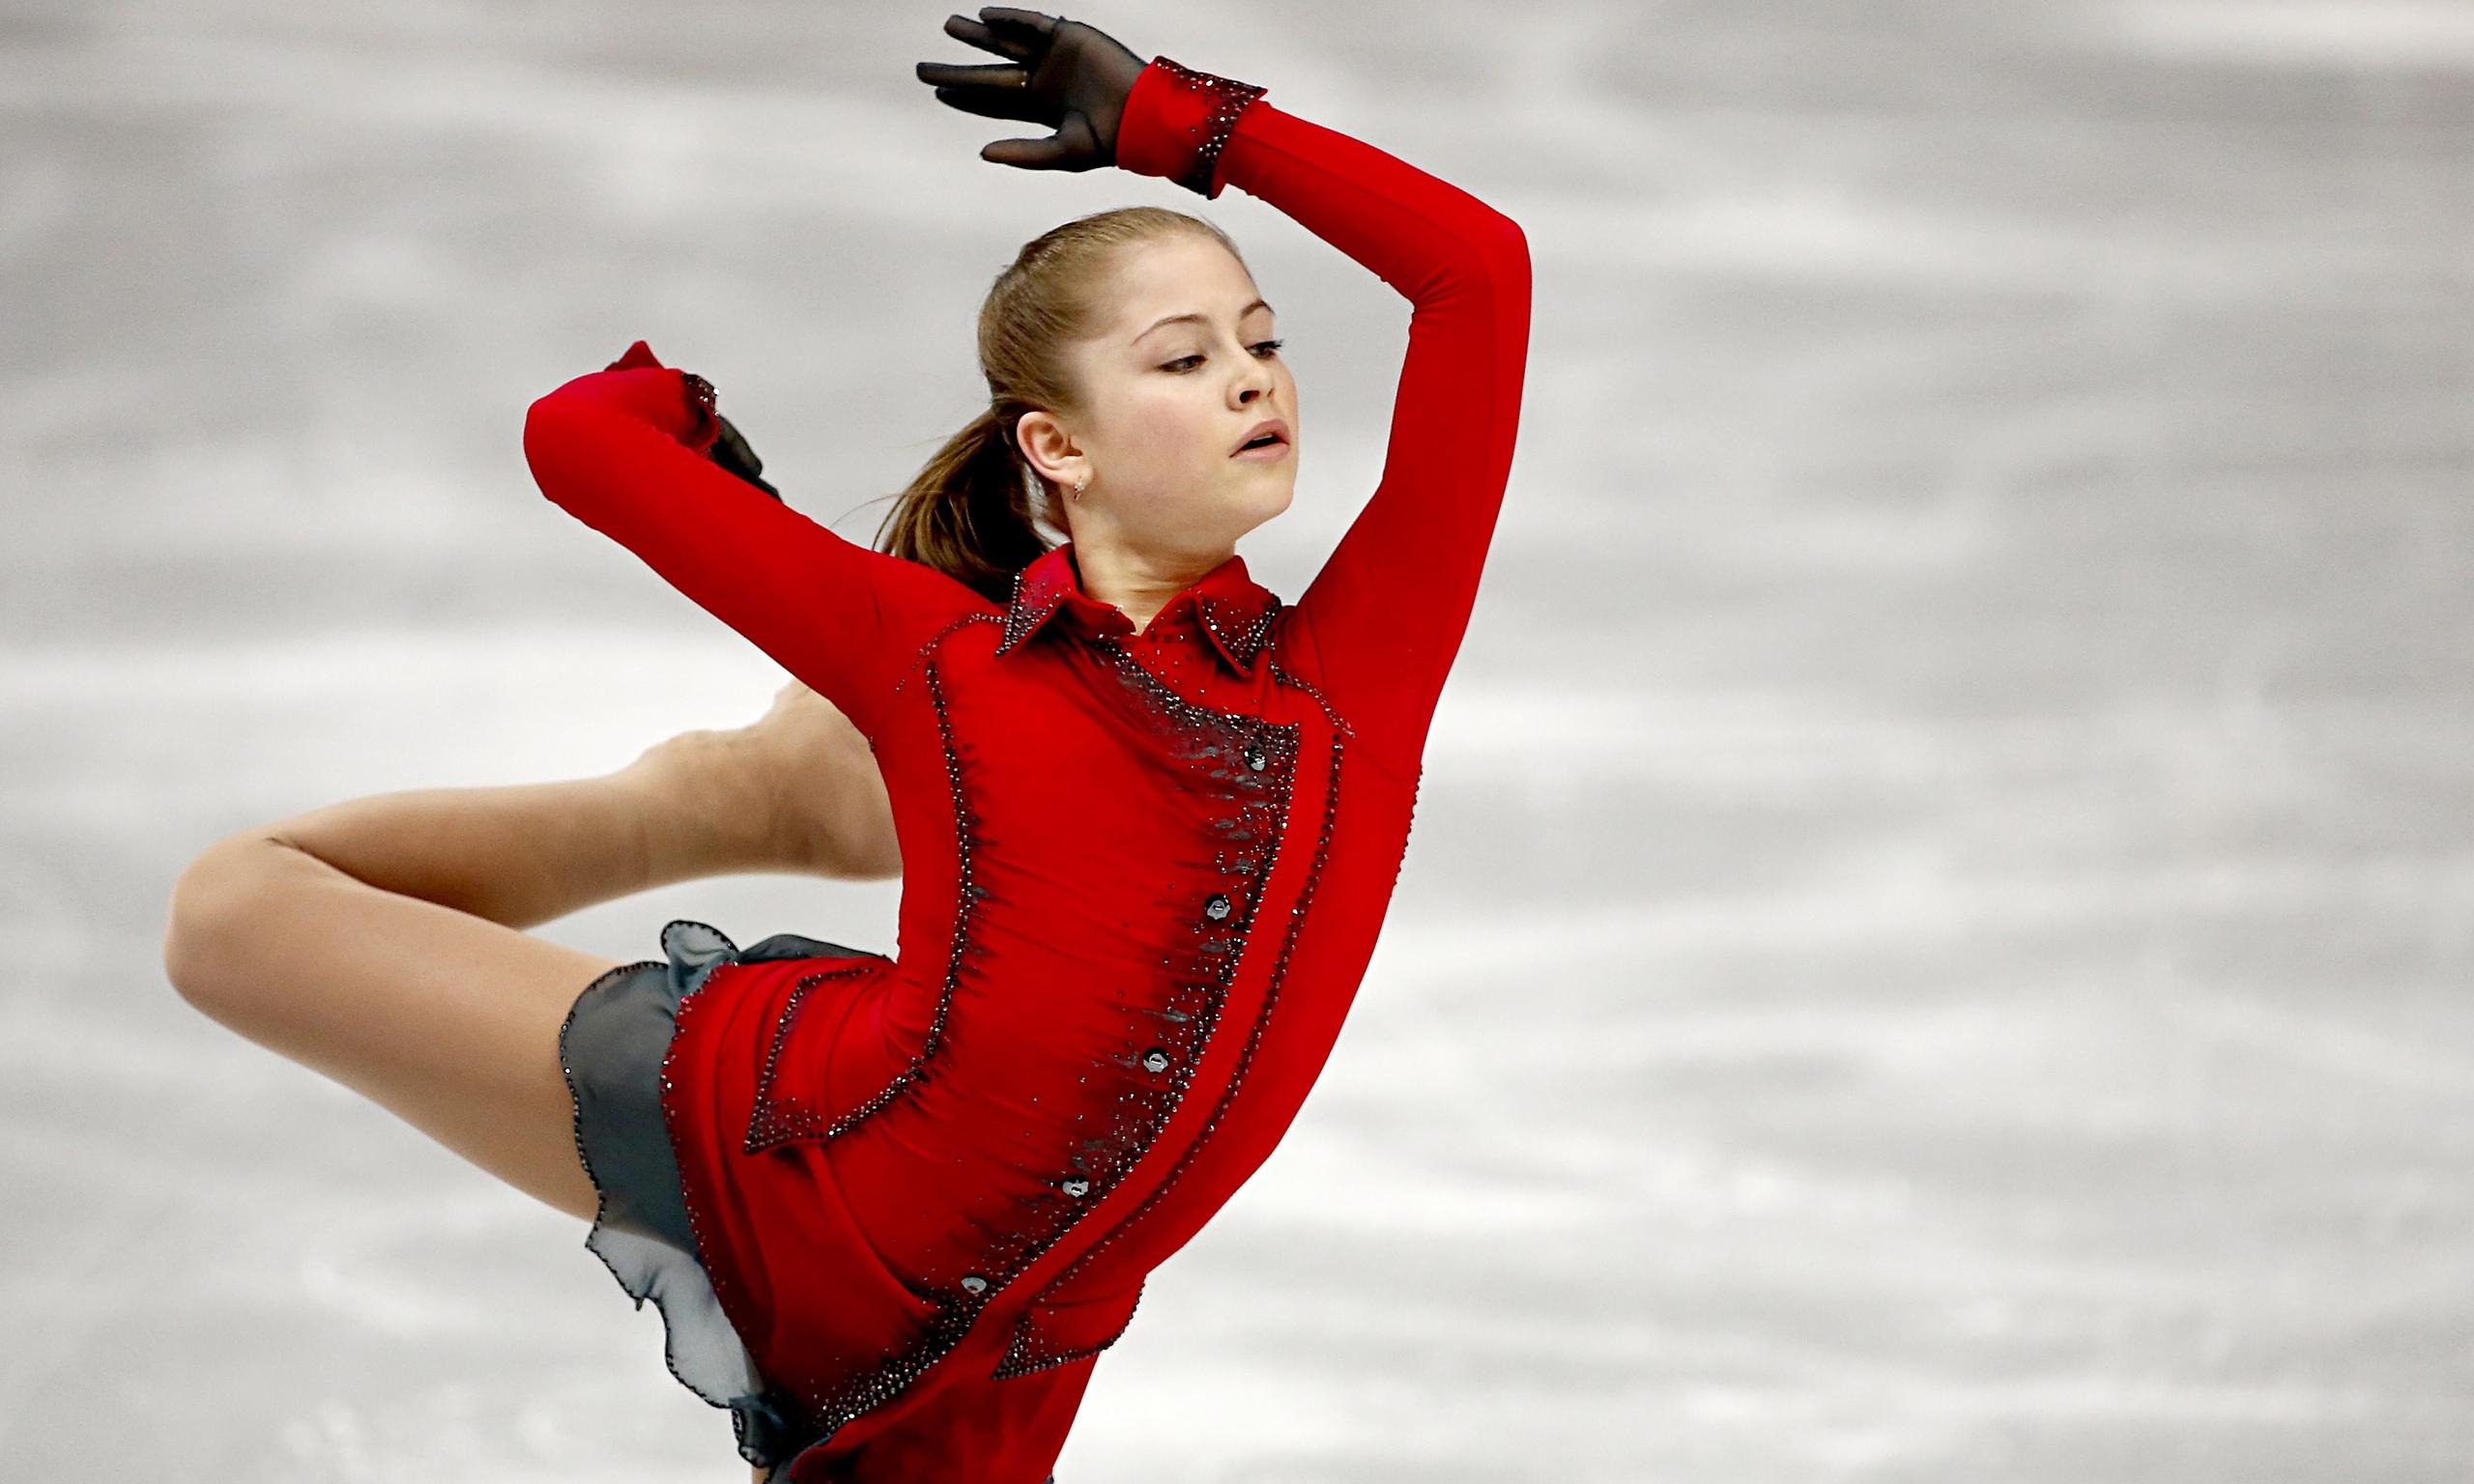 Julia Lipnitskaya ice figure skating at the Olympic Games ...